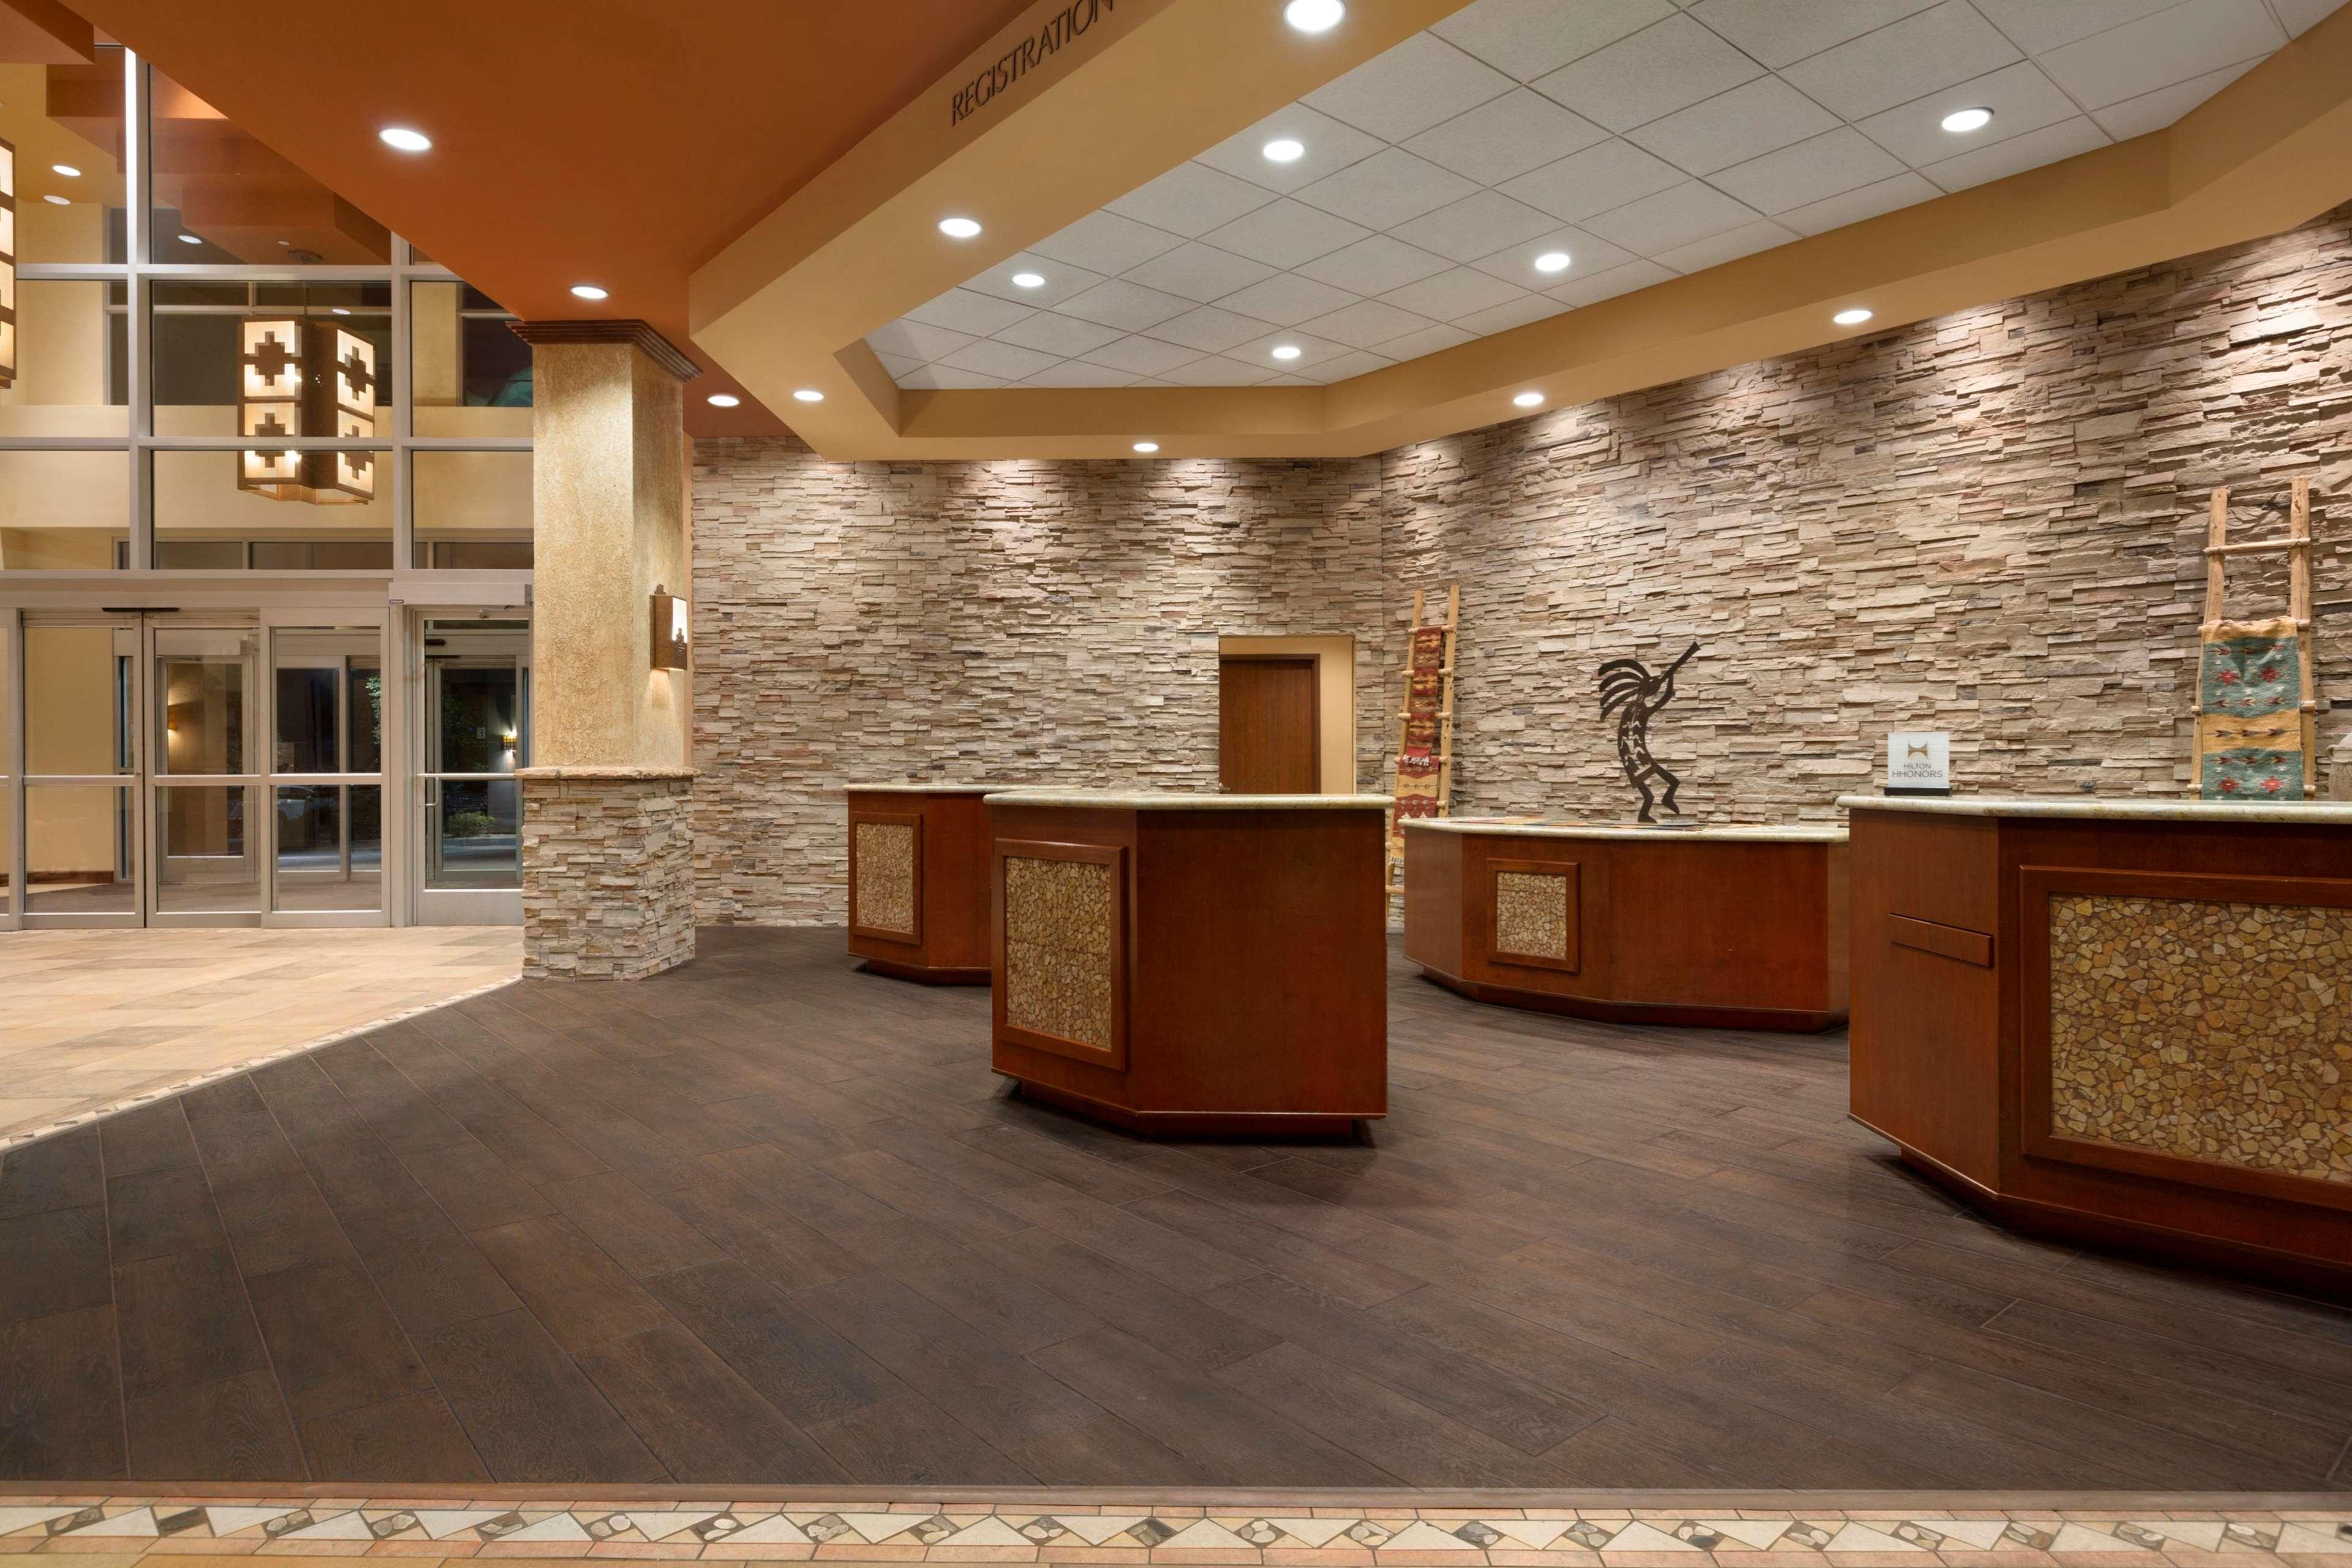 Embassy Suites by Hilton Albuquerque Hotel & Spa image 34